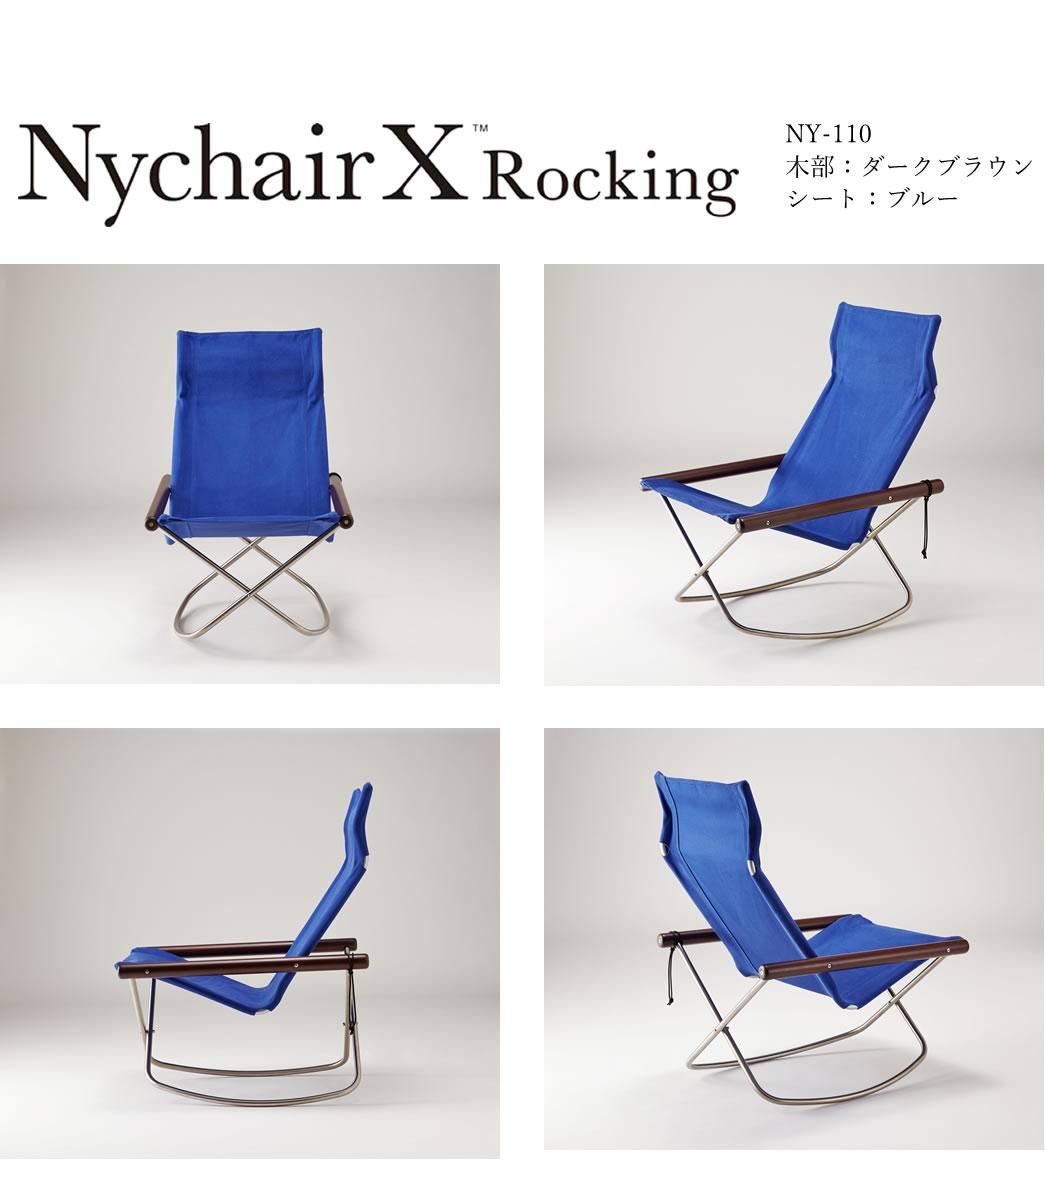 NY-110 NychairX rocking ニーチェアエックス ロッキング 木部:ダークブラウン/シート:ブルー